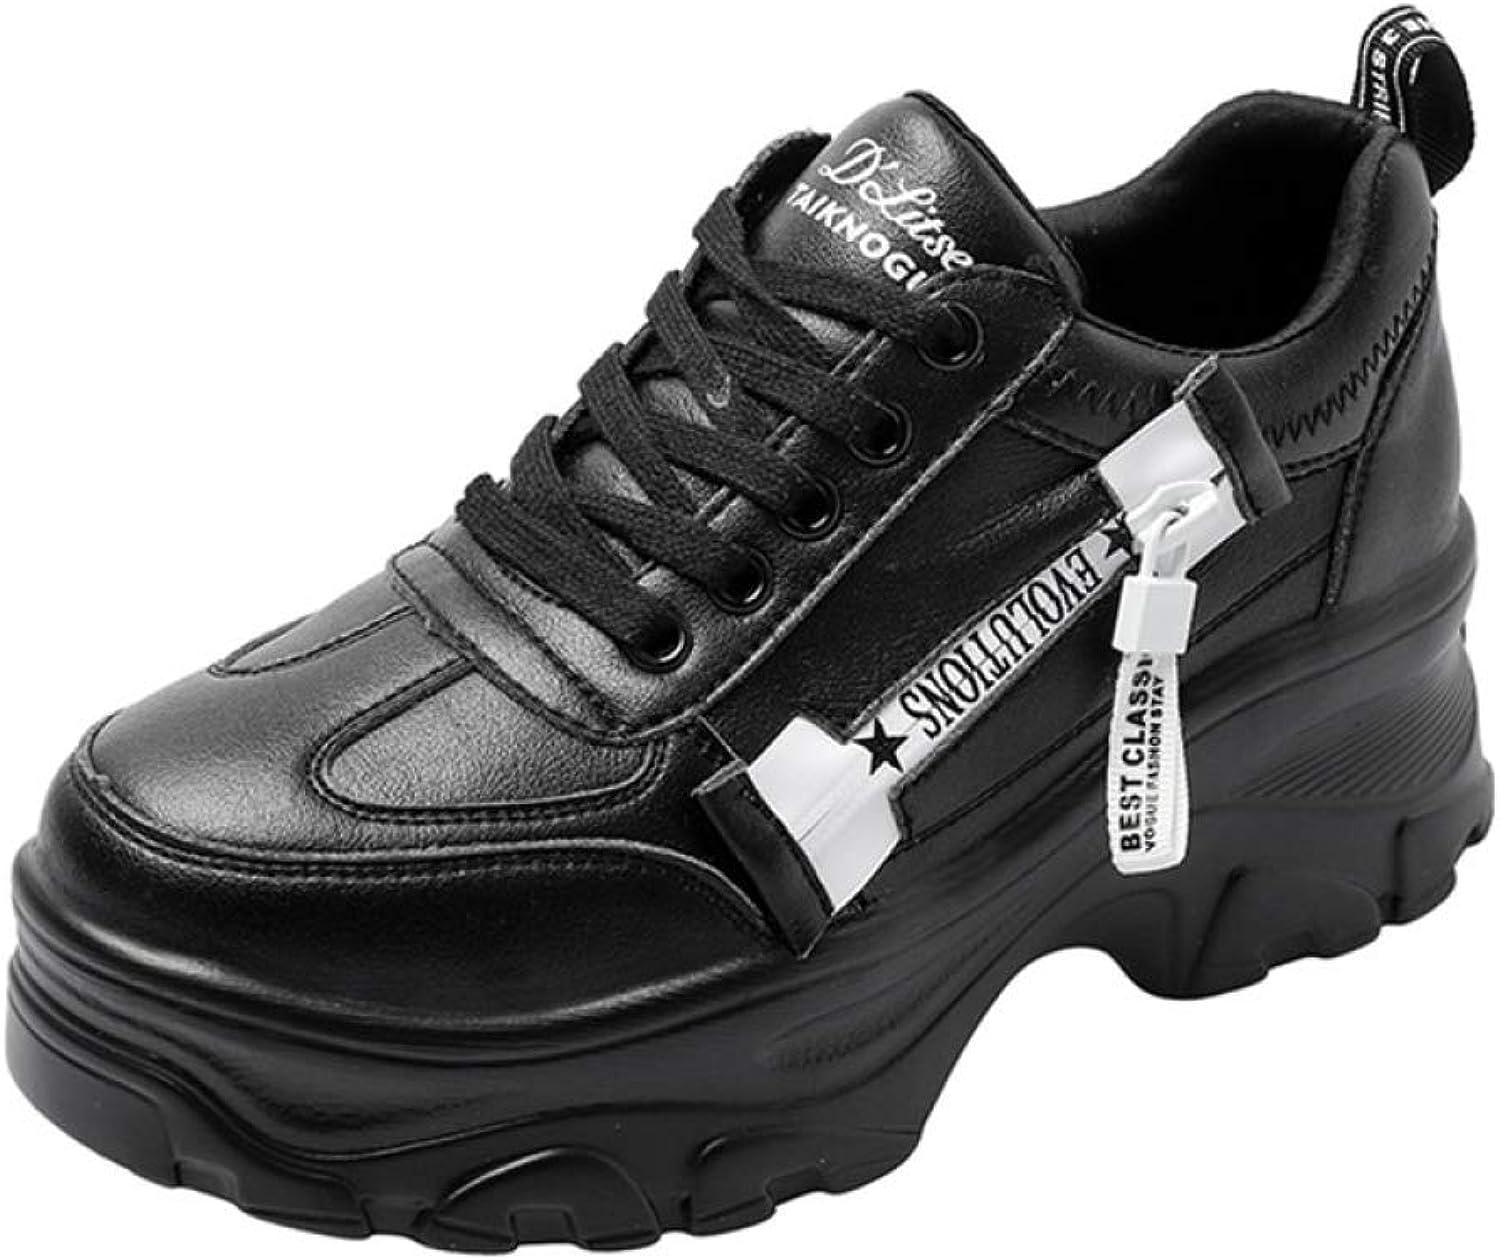 T-JULY Tenis High Heels Women Sneakers Platform Women Trainers shoes Casual Ladies shoes